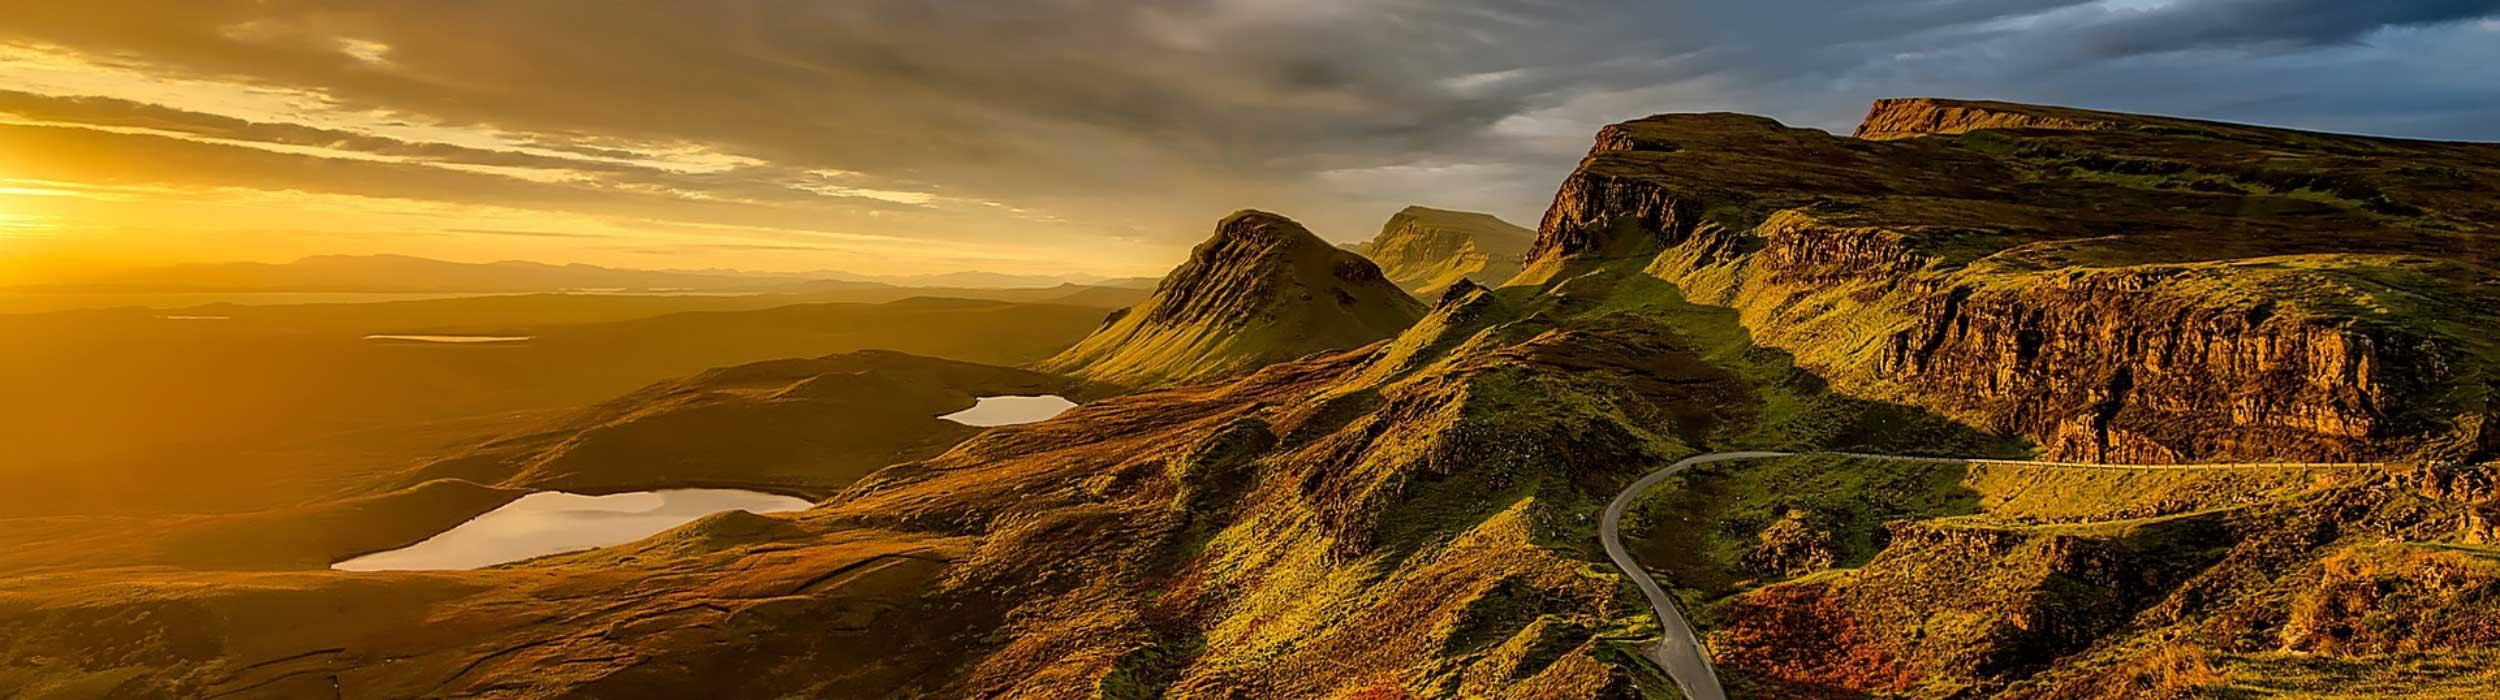 scotland-1761292_1920-2500x700_c-neu